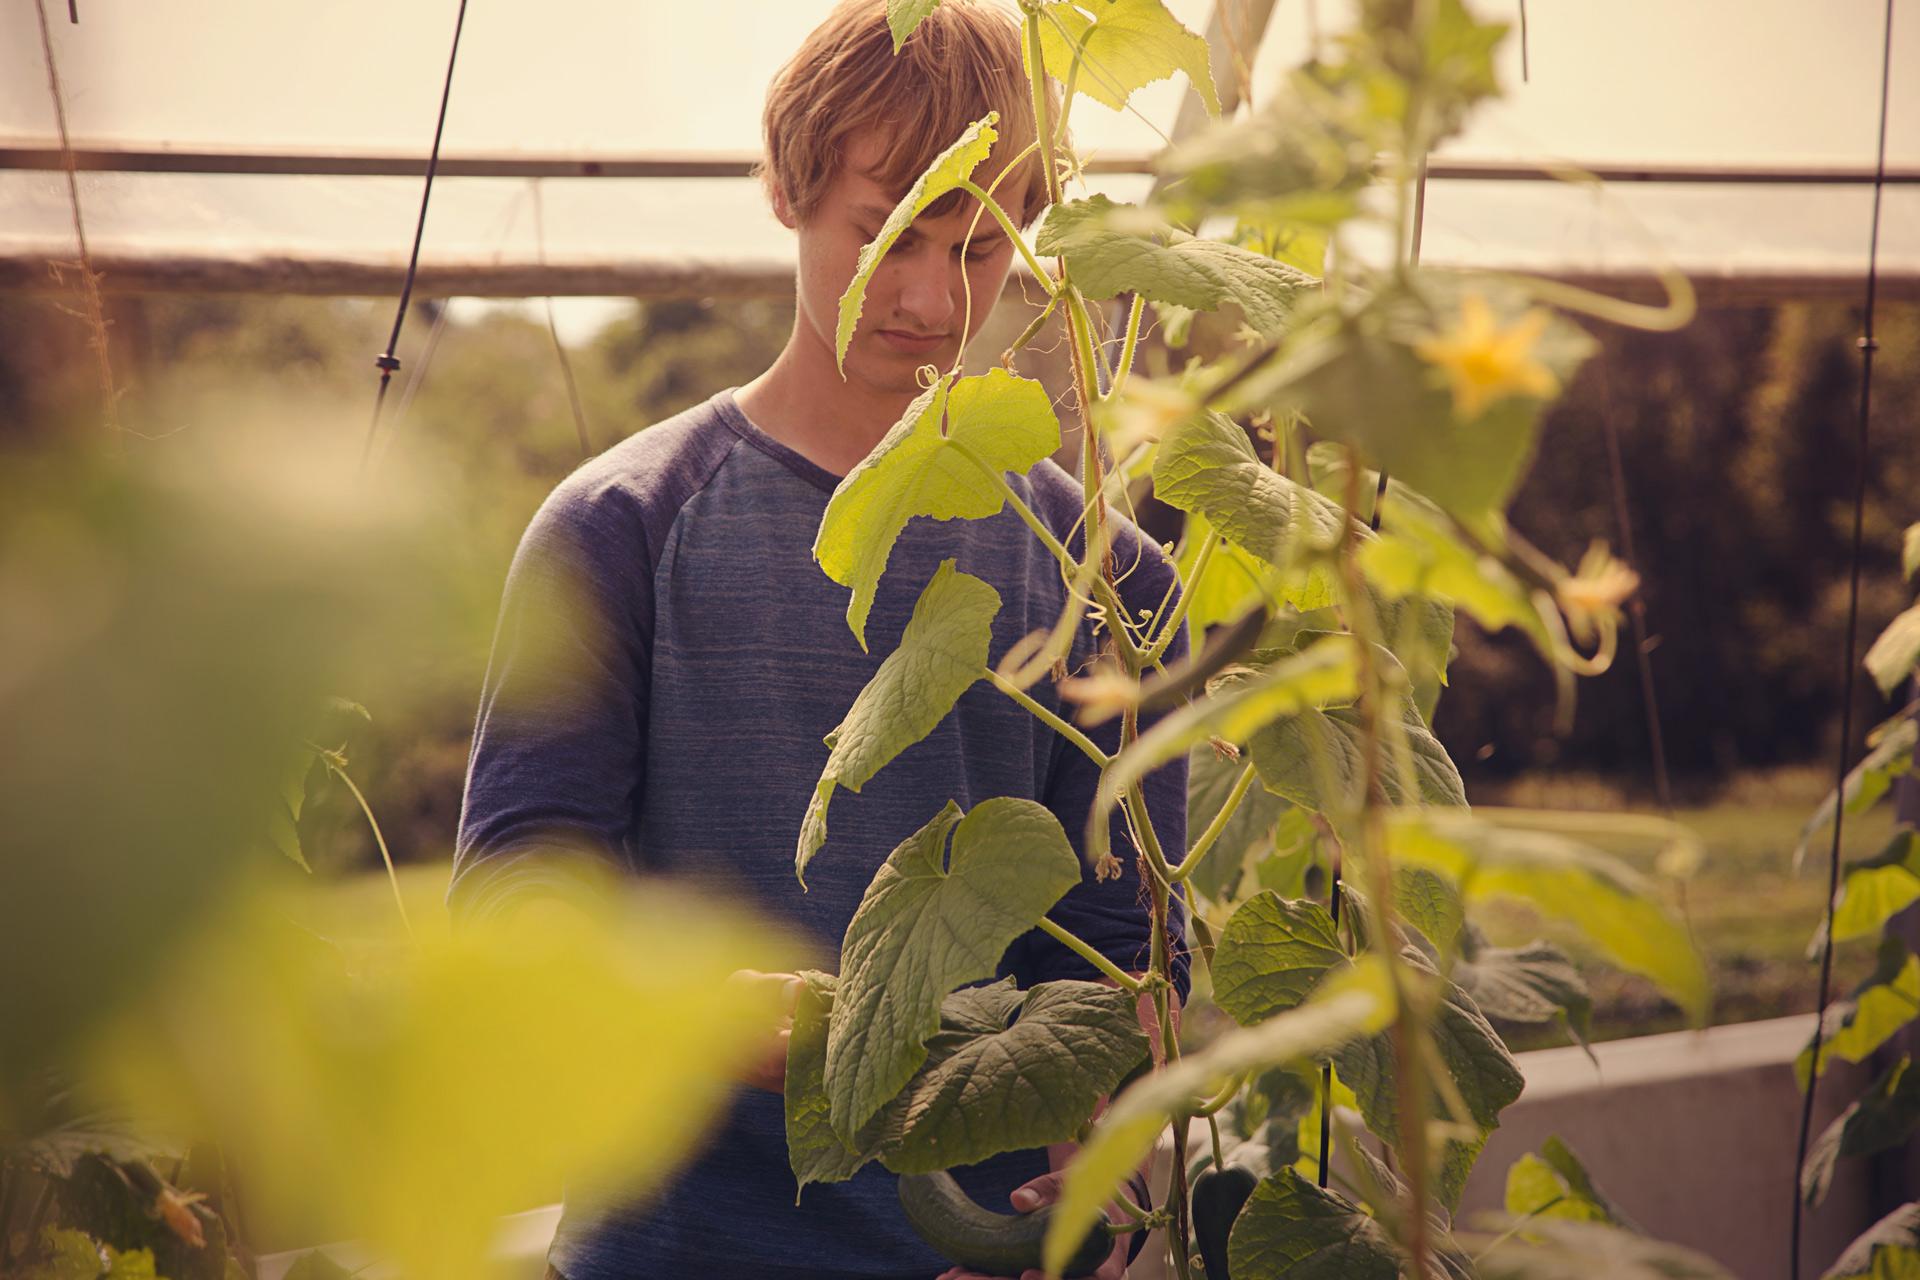 student-in-a-greenhouse-mackay-gardens-unity-parisleaf.jpg